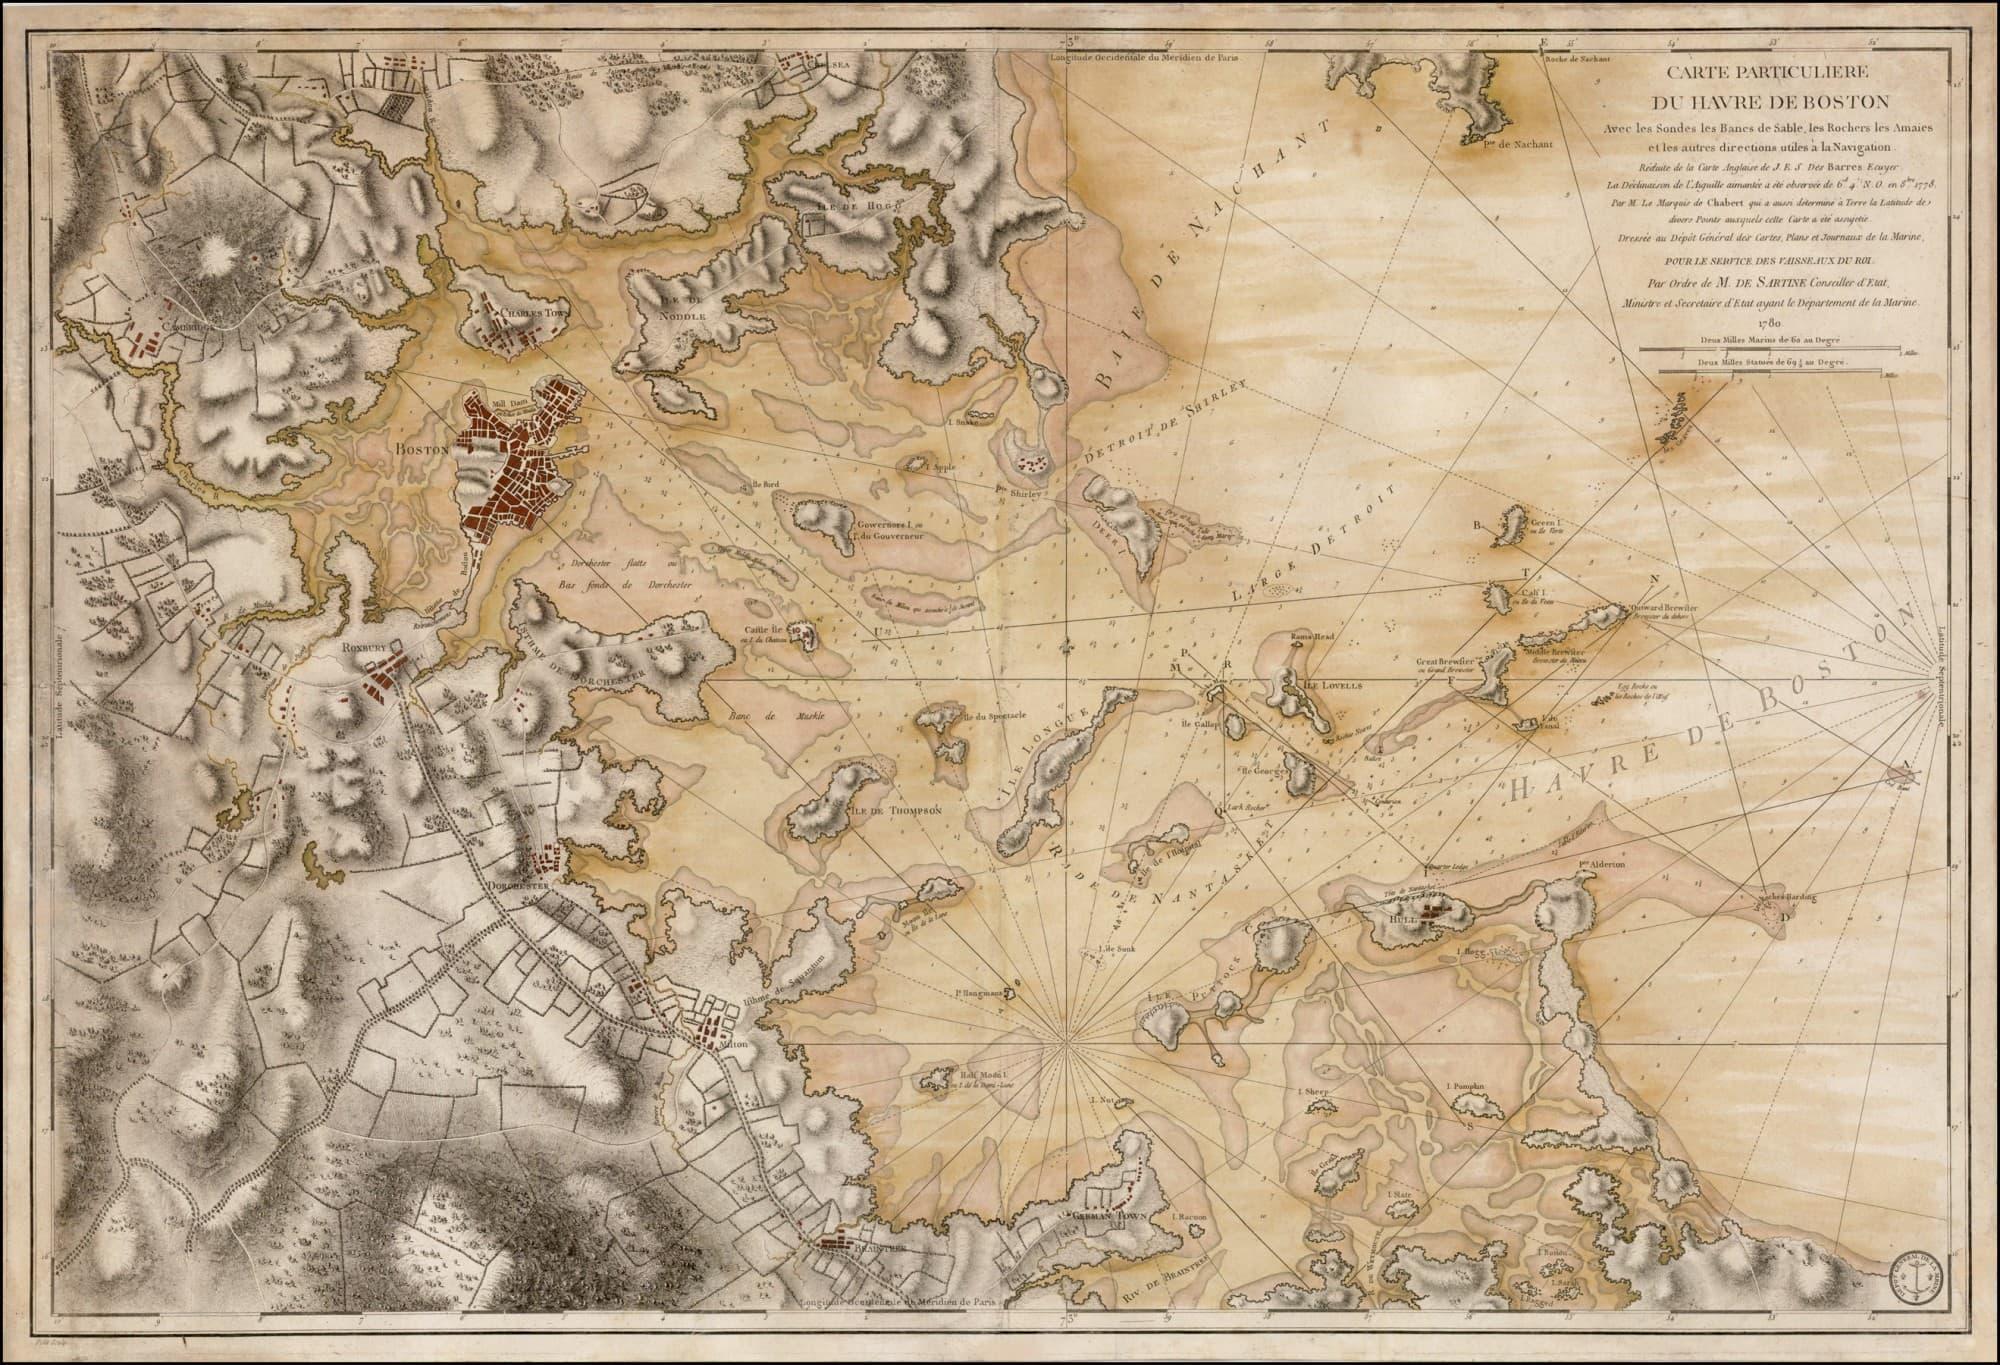 French Revolutionaryera chart of Boston Harbor updating des Barres